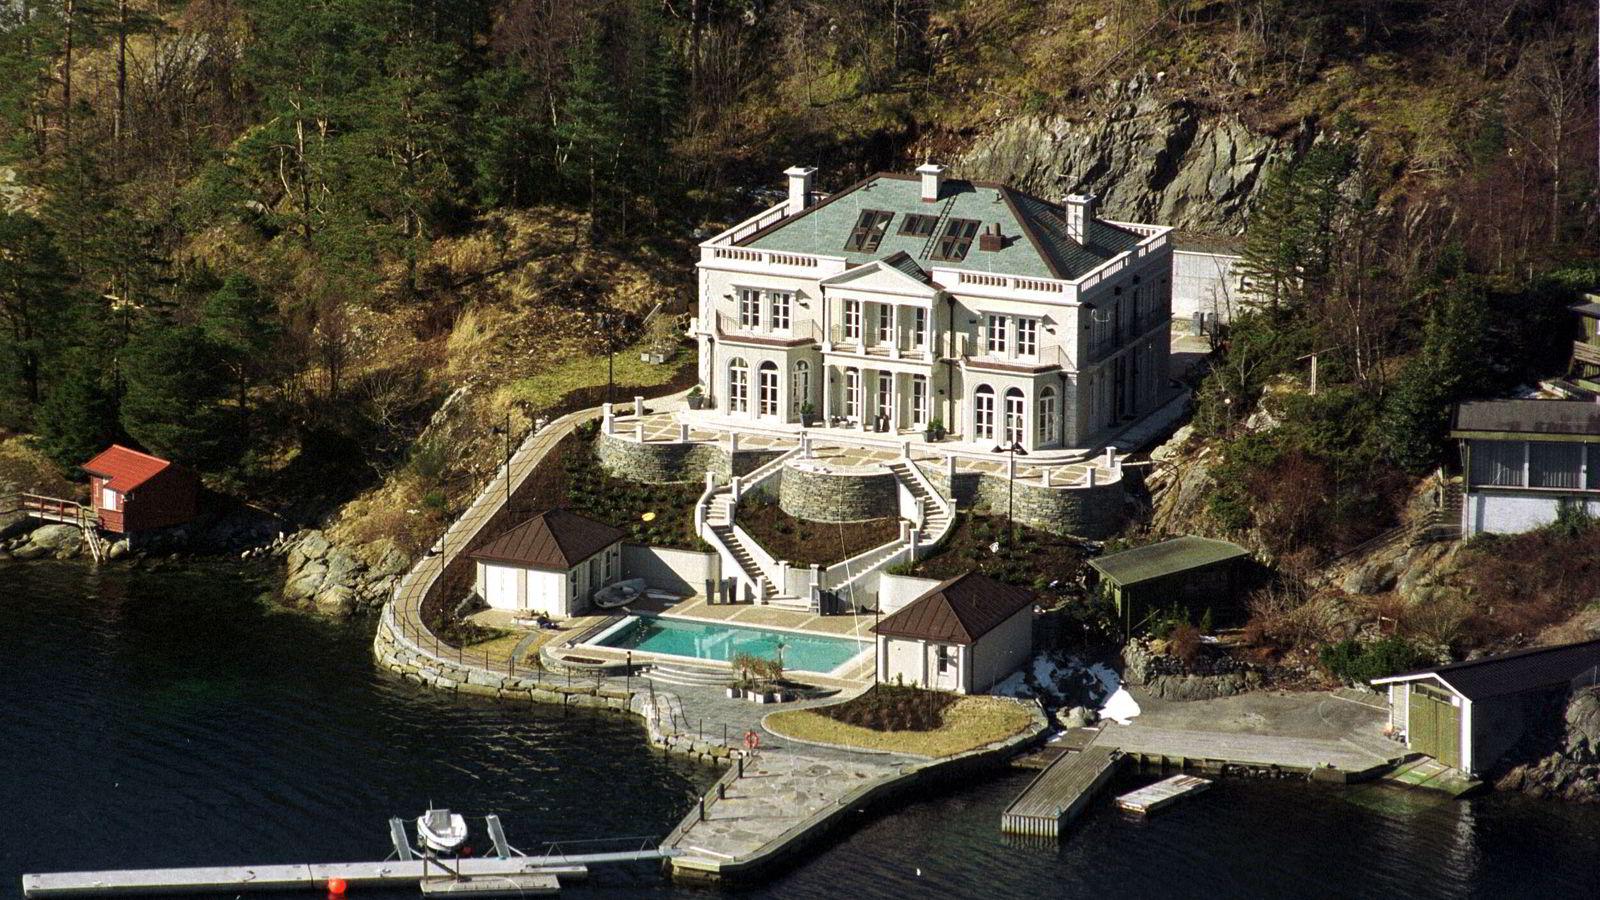 Bergen Asylmottak